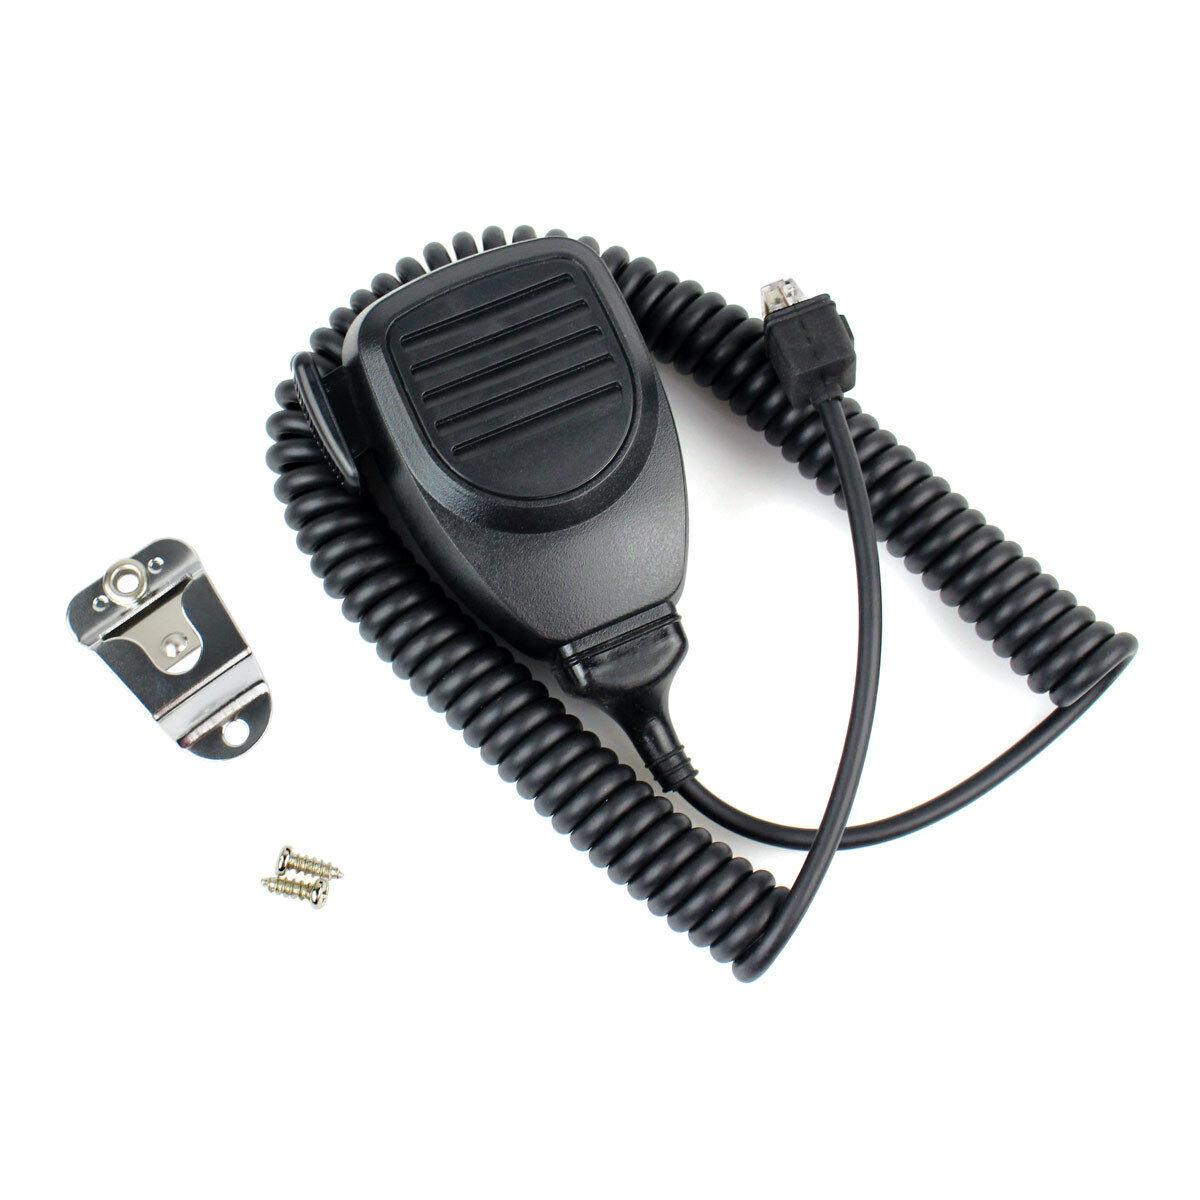 8Pin Speaker Microphone Mic For Kenwood KMC-30 TK-760 TK768 TK868 TK-980 TM-271A TM-461A TM-471A TK-768G TK-868G HAM Radio